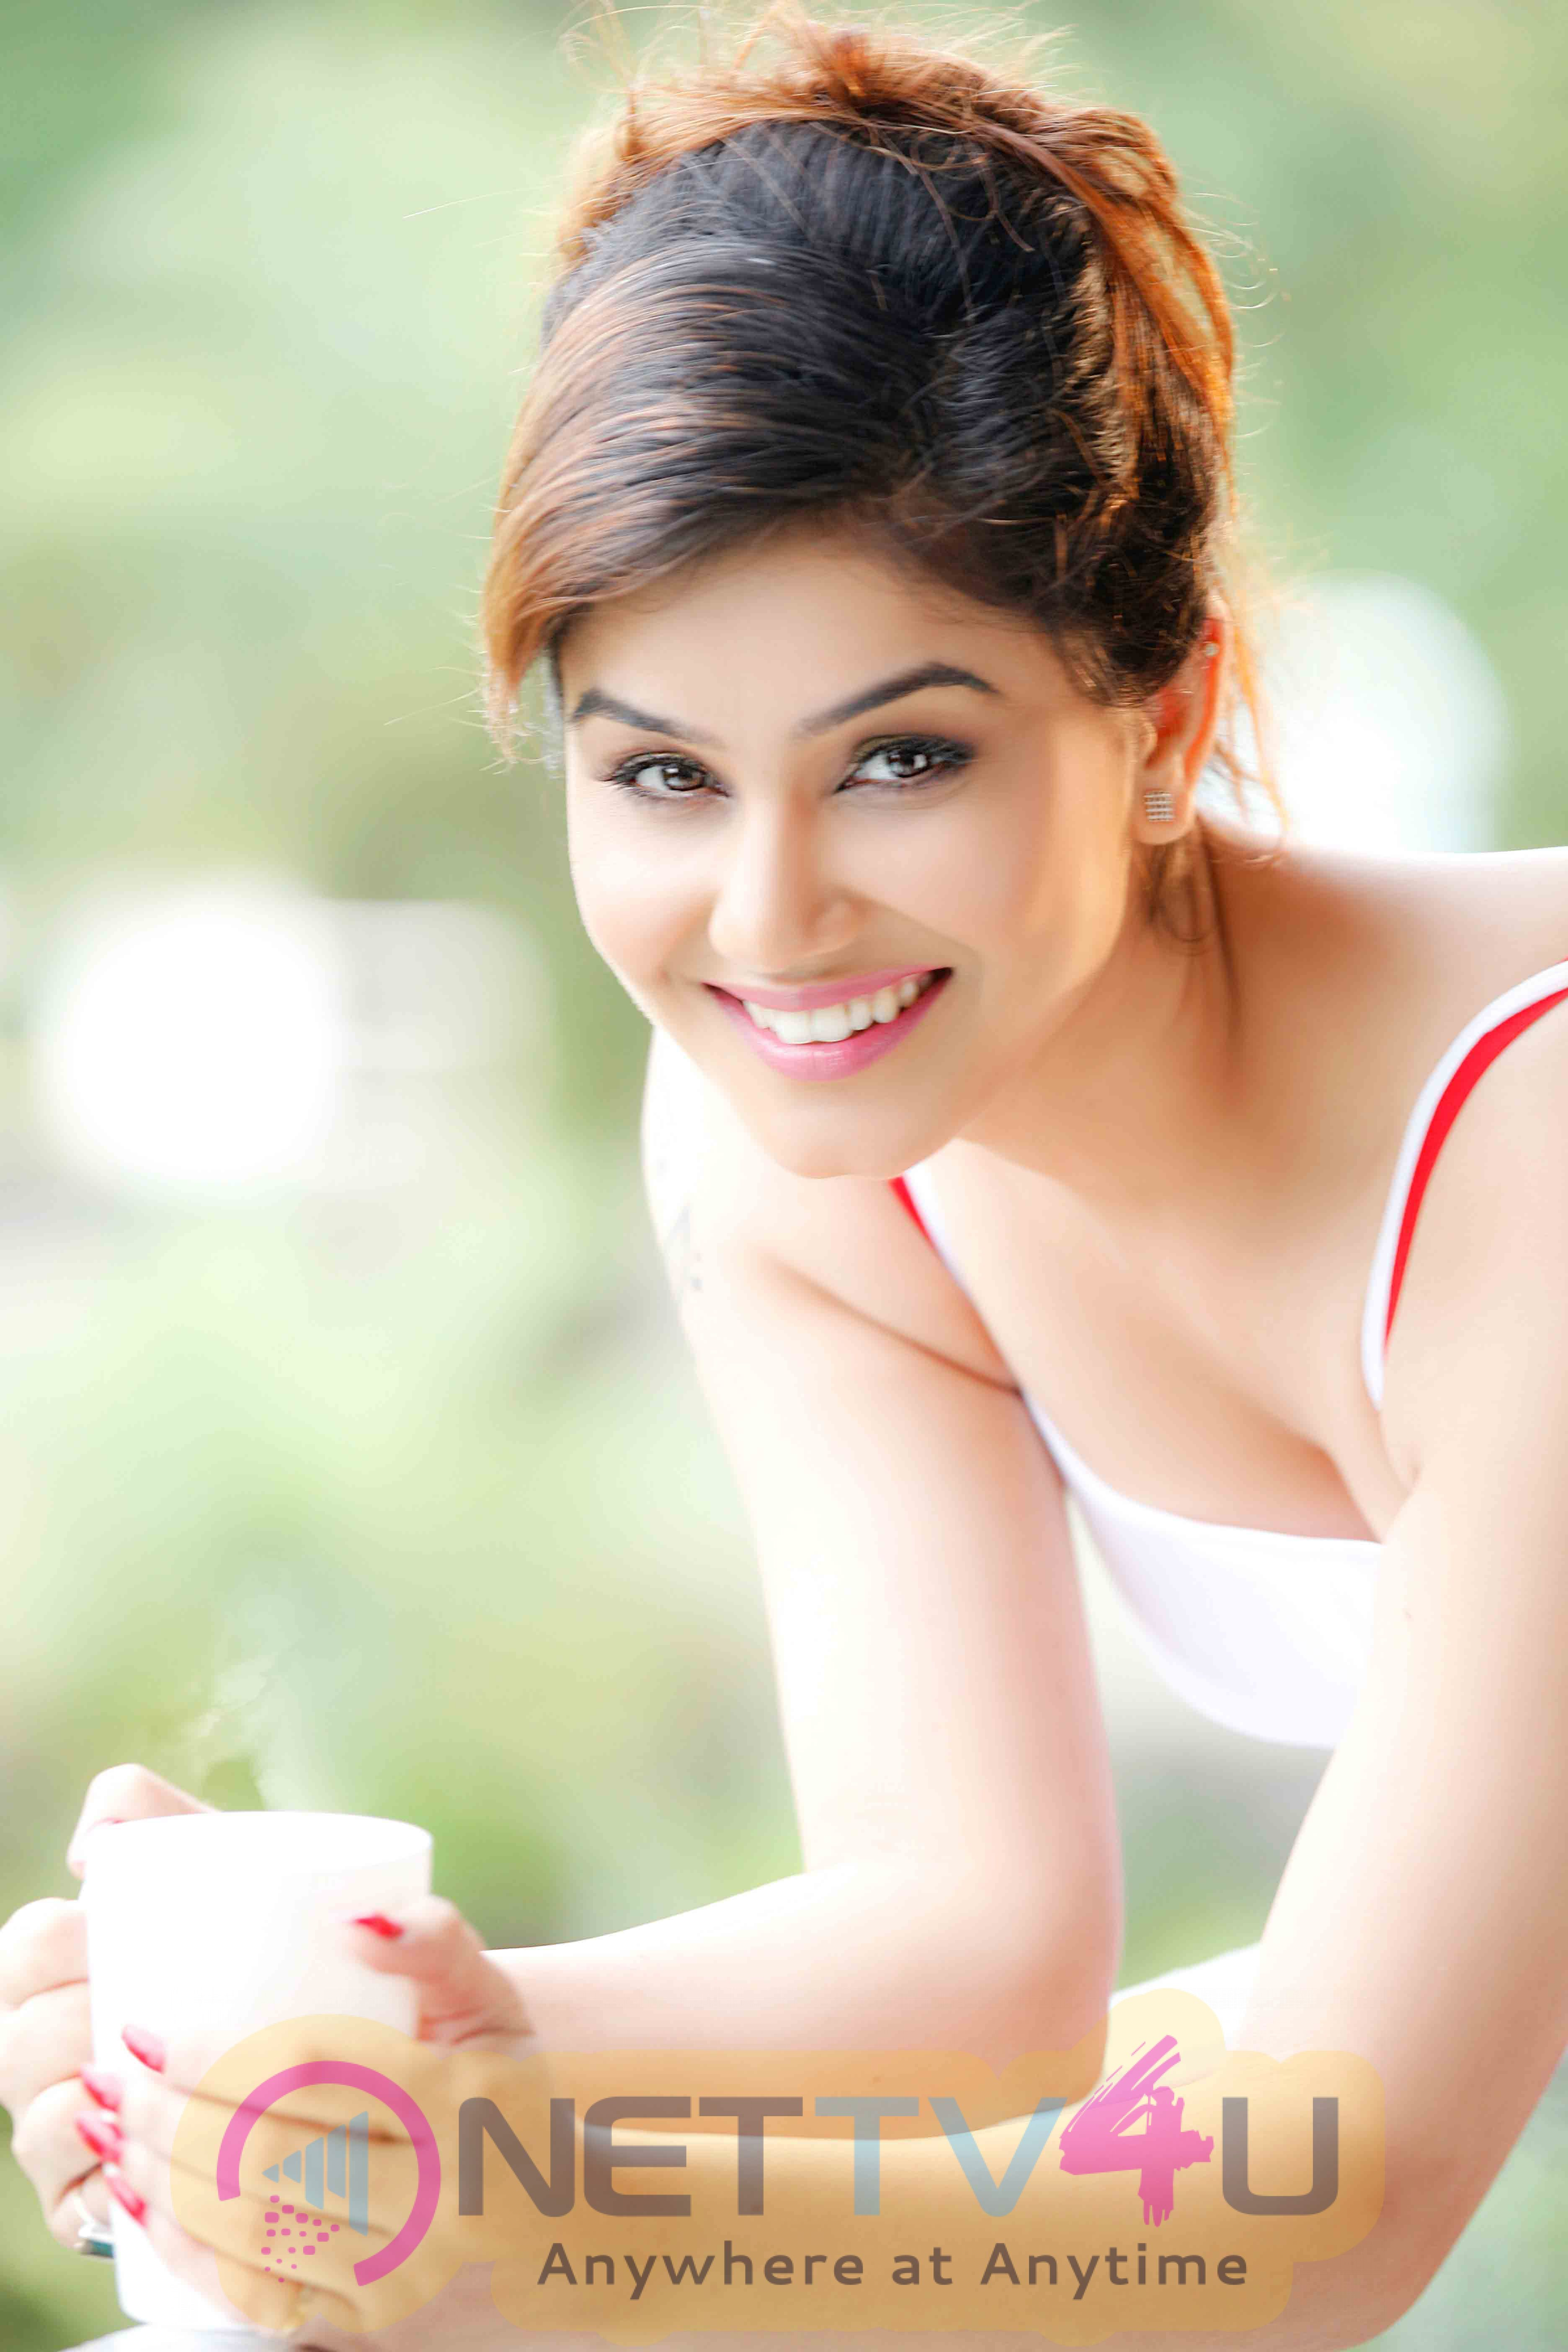 Working With Riteish Deshmukh, Vivek Oberoi Dream Comes True Says Actress Kangana Sharma Glamorous Stills